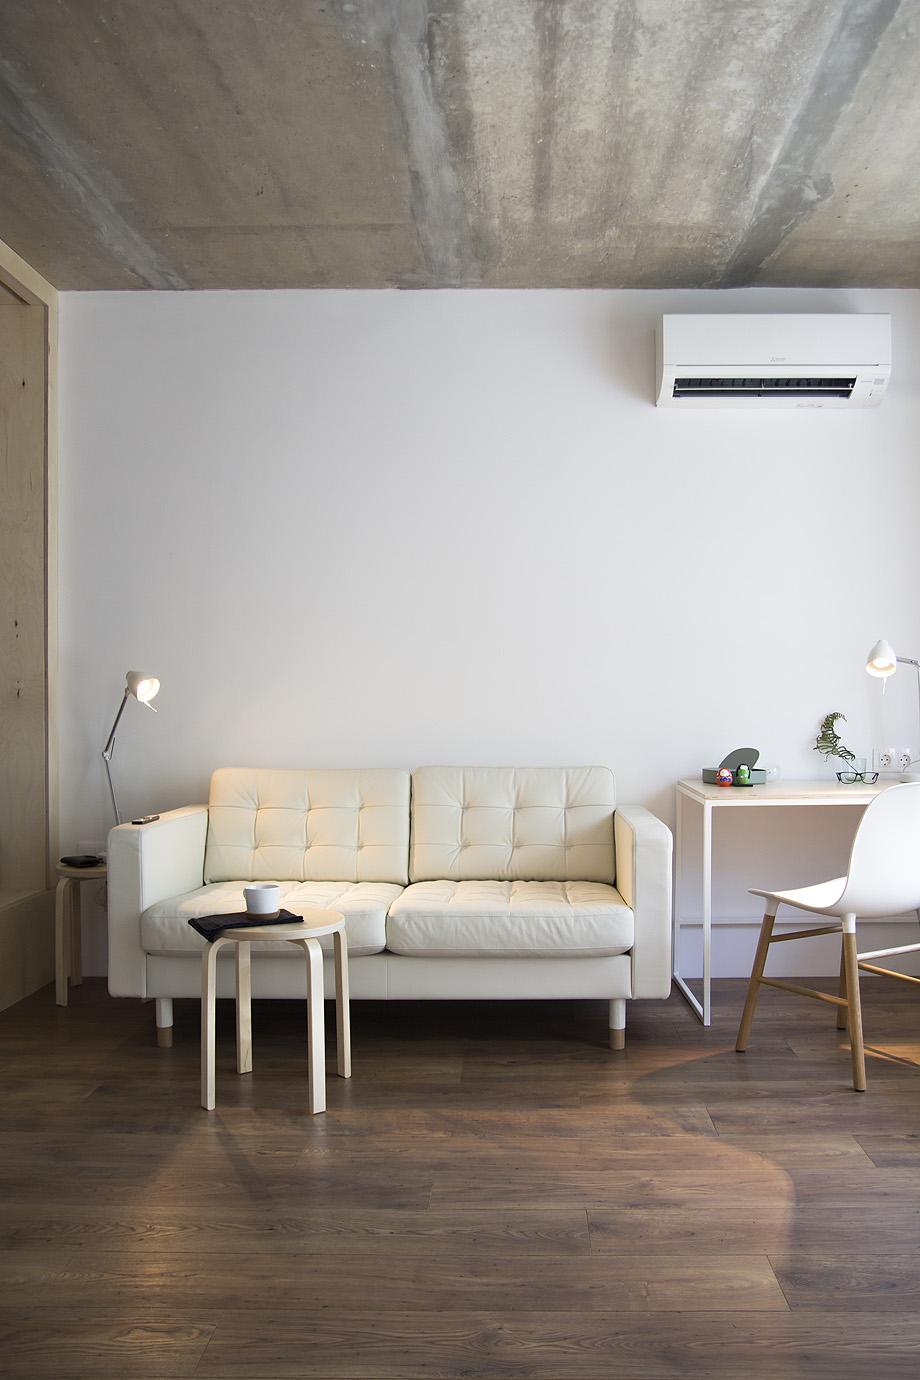 apartamento en rusia por kdva architects - foto daria koloskova (6)